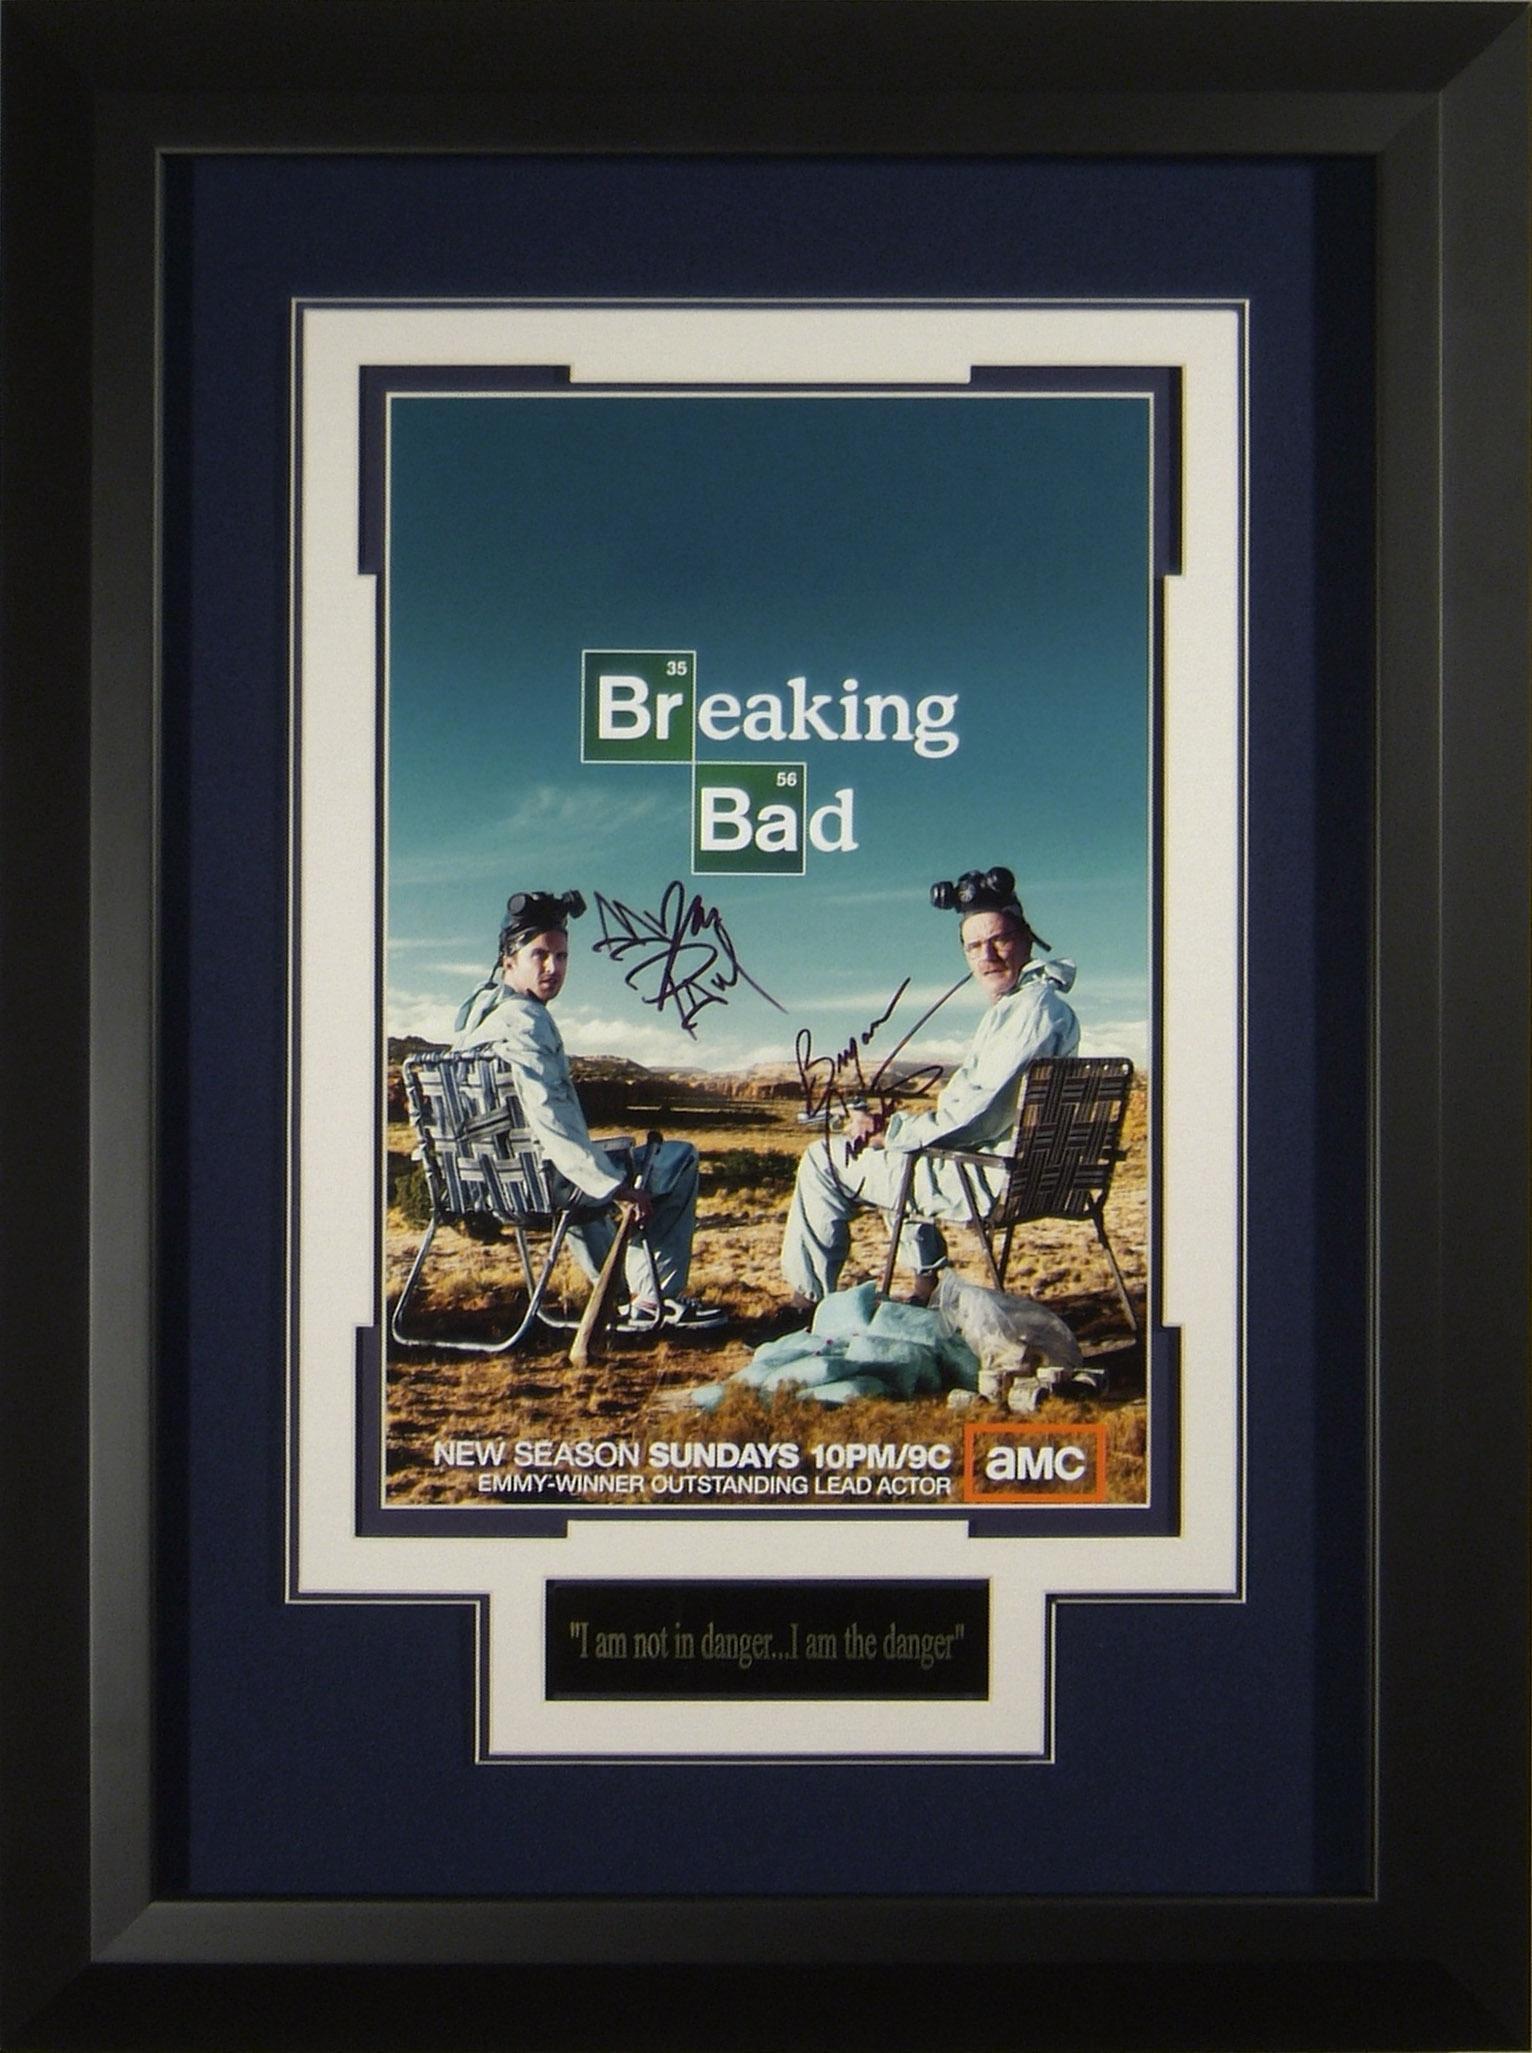 Breaking bad cast signed 11x17 poster framed display jeuxipadfo Choice Image